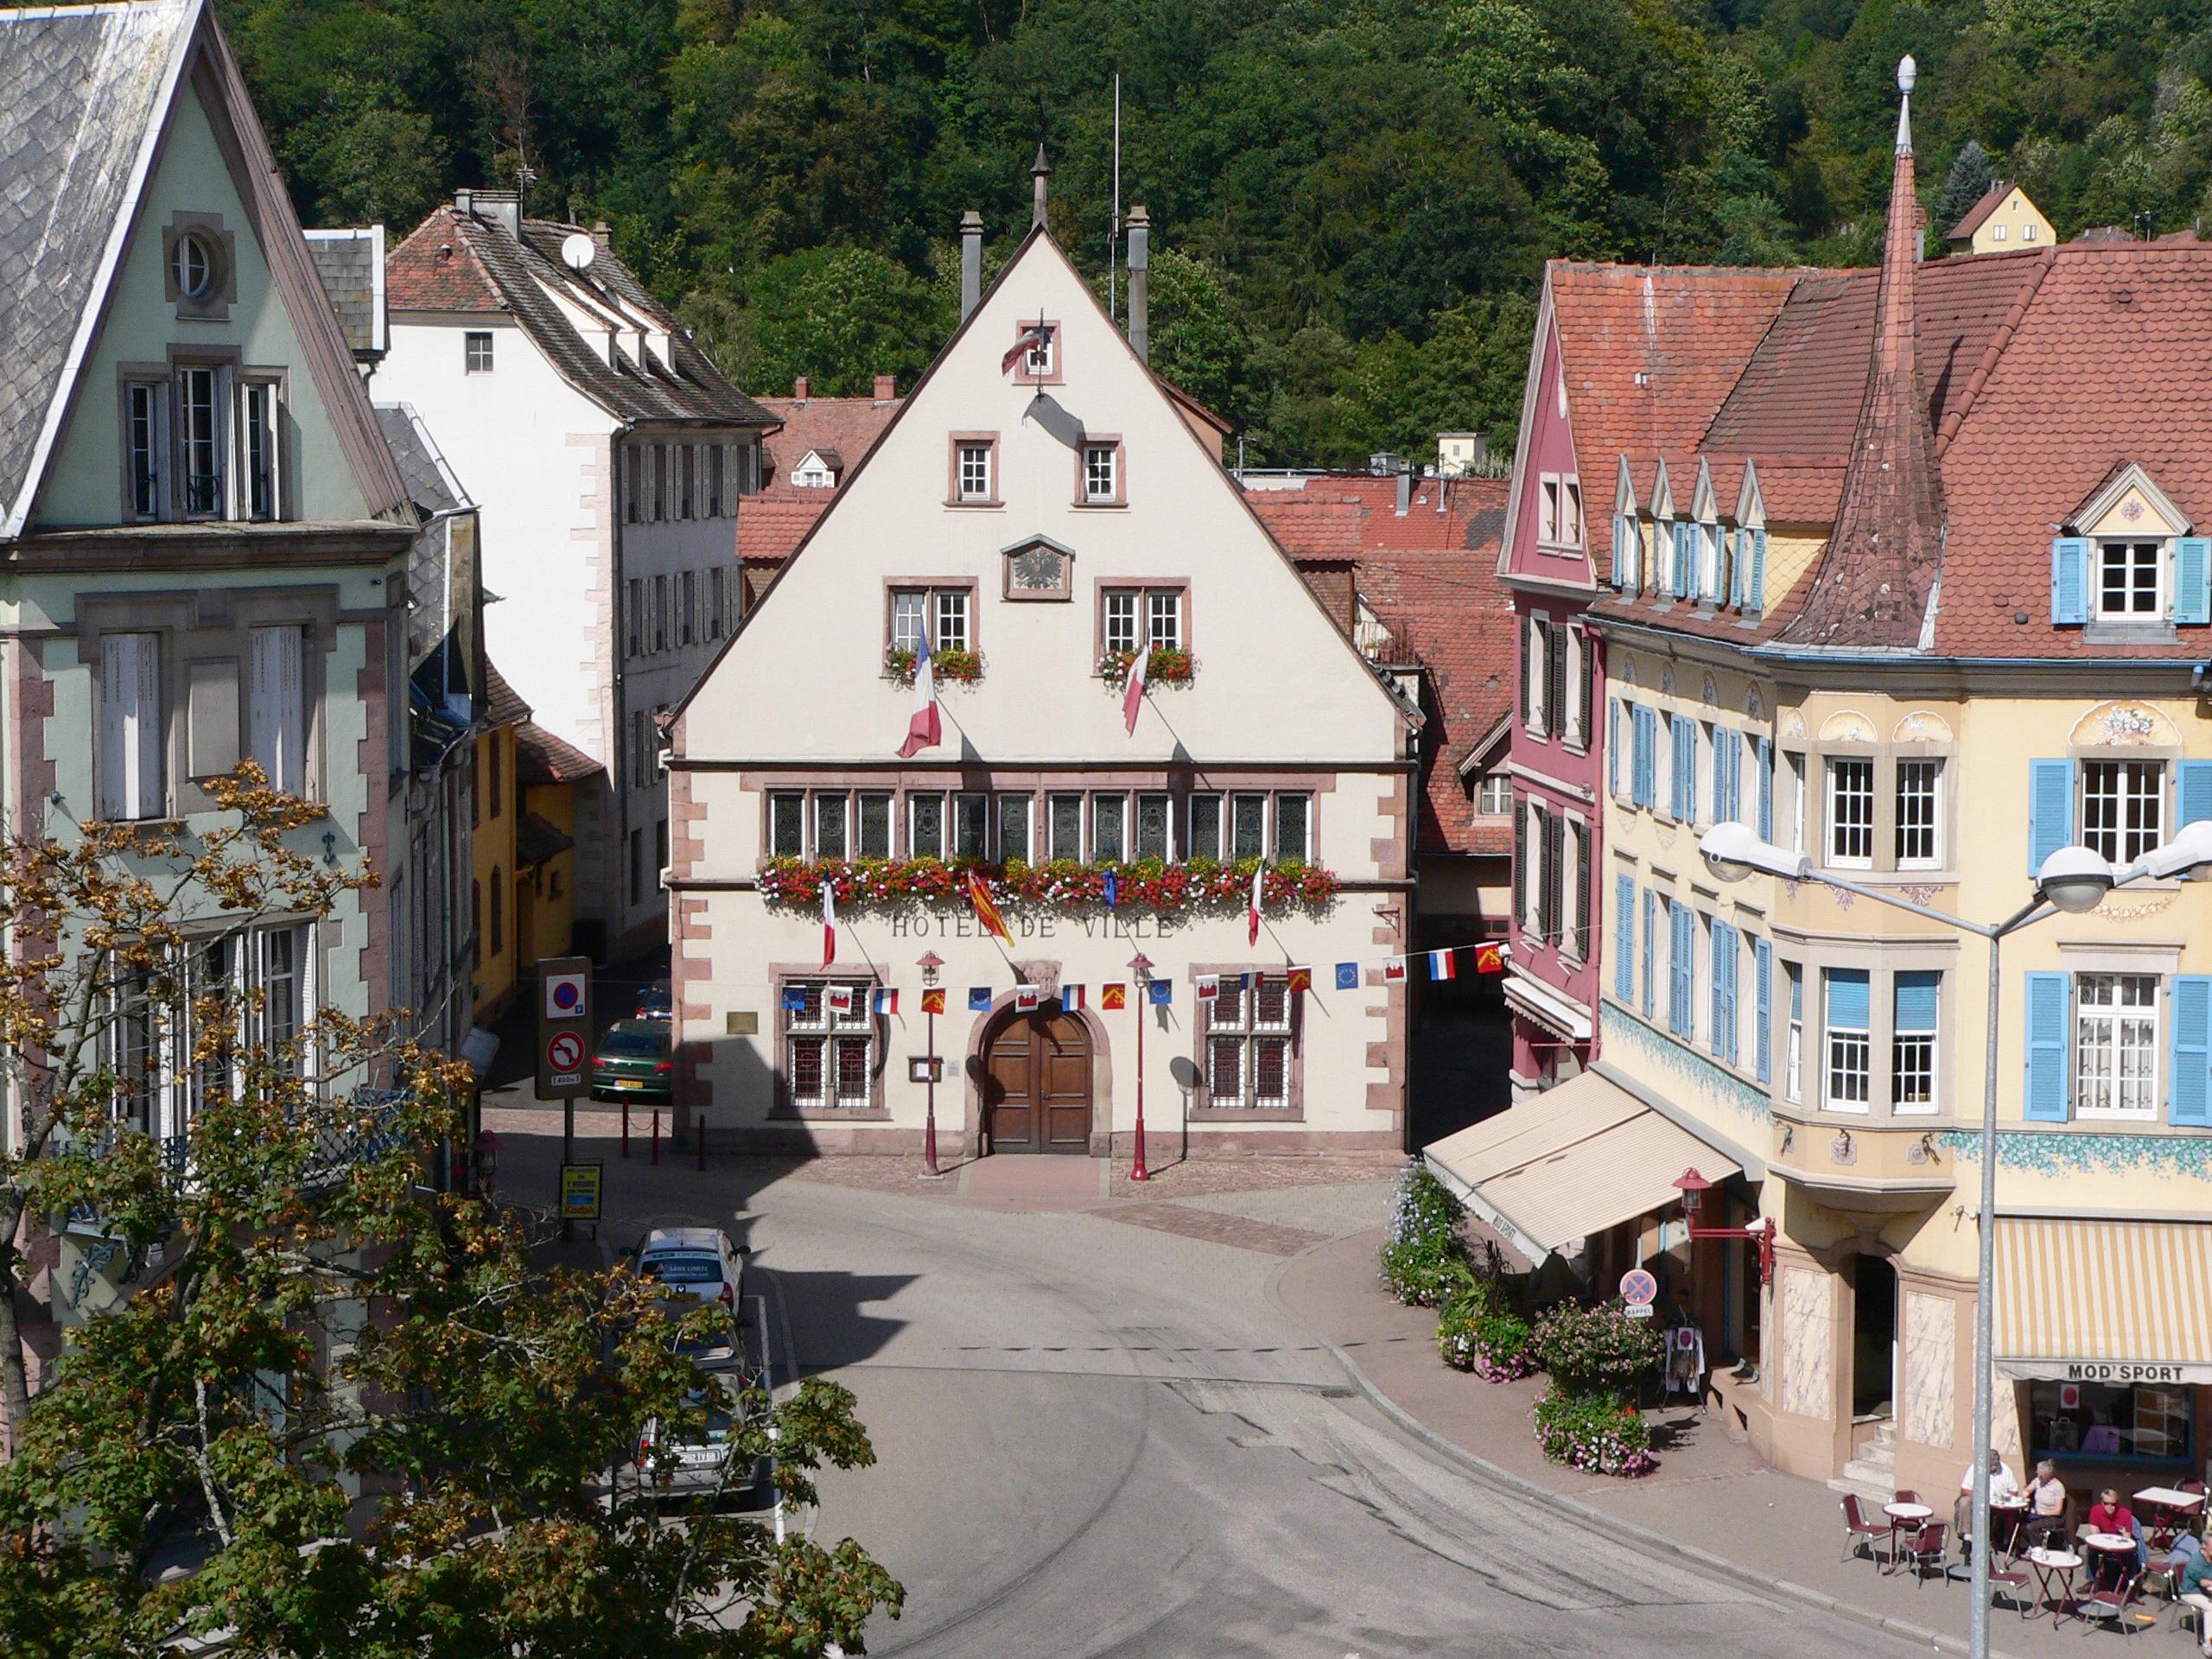 https://upload.wikimedia.org/wikipedia/commons/f/f8/Mairie_5.JPG?uselang=fr